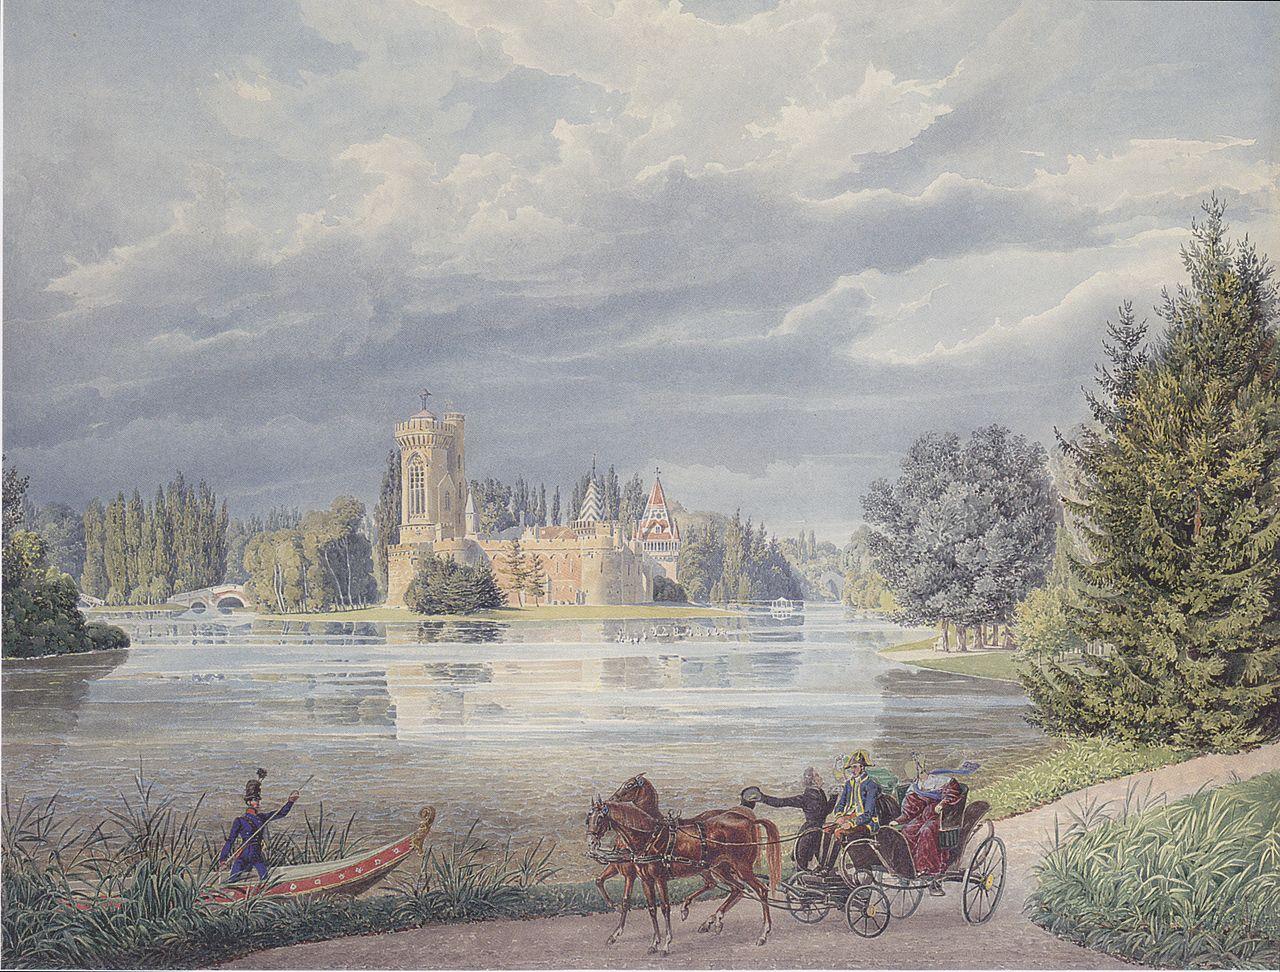 1280px-Eduard_Gurk_-_Blick_auf_Schloss_und_Park_Laxenburg_bei_Wien_-_ca_1838.jpeg